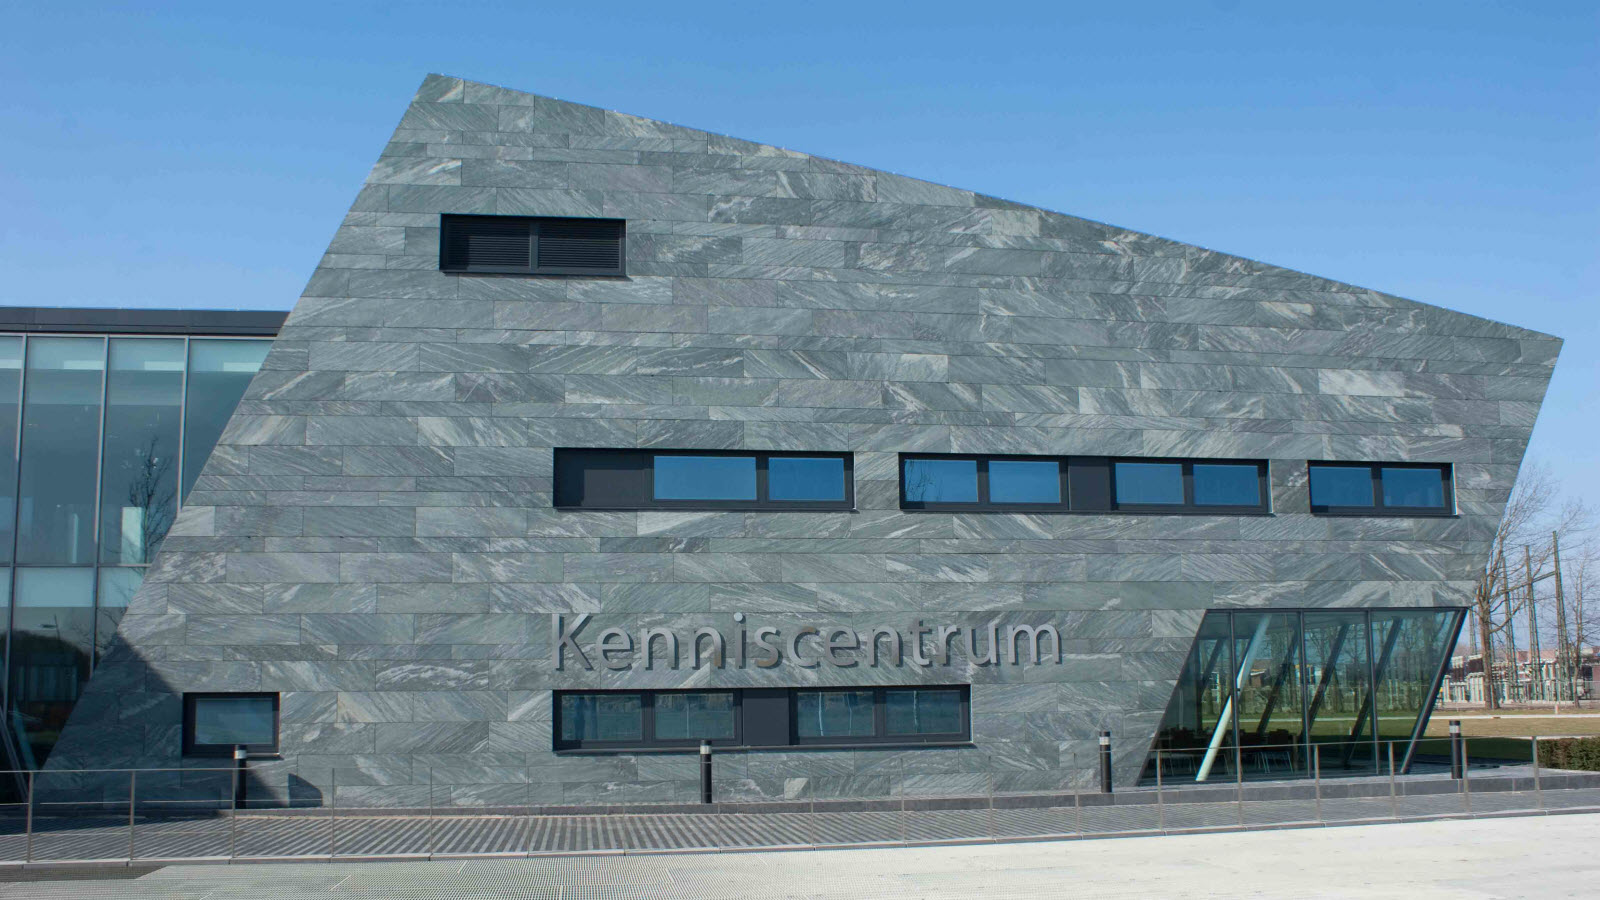 Kenniscentrum Rabobank Echt (3)